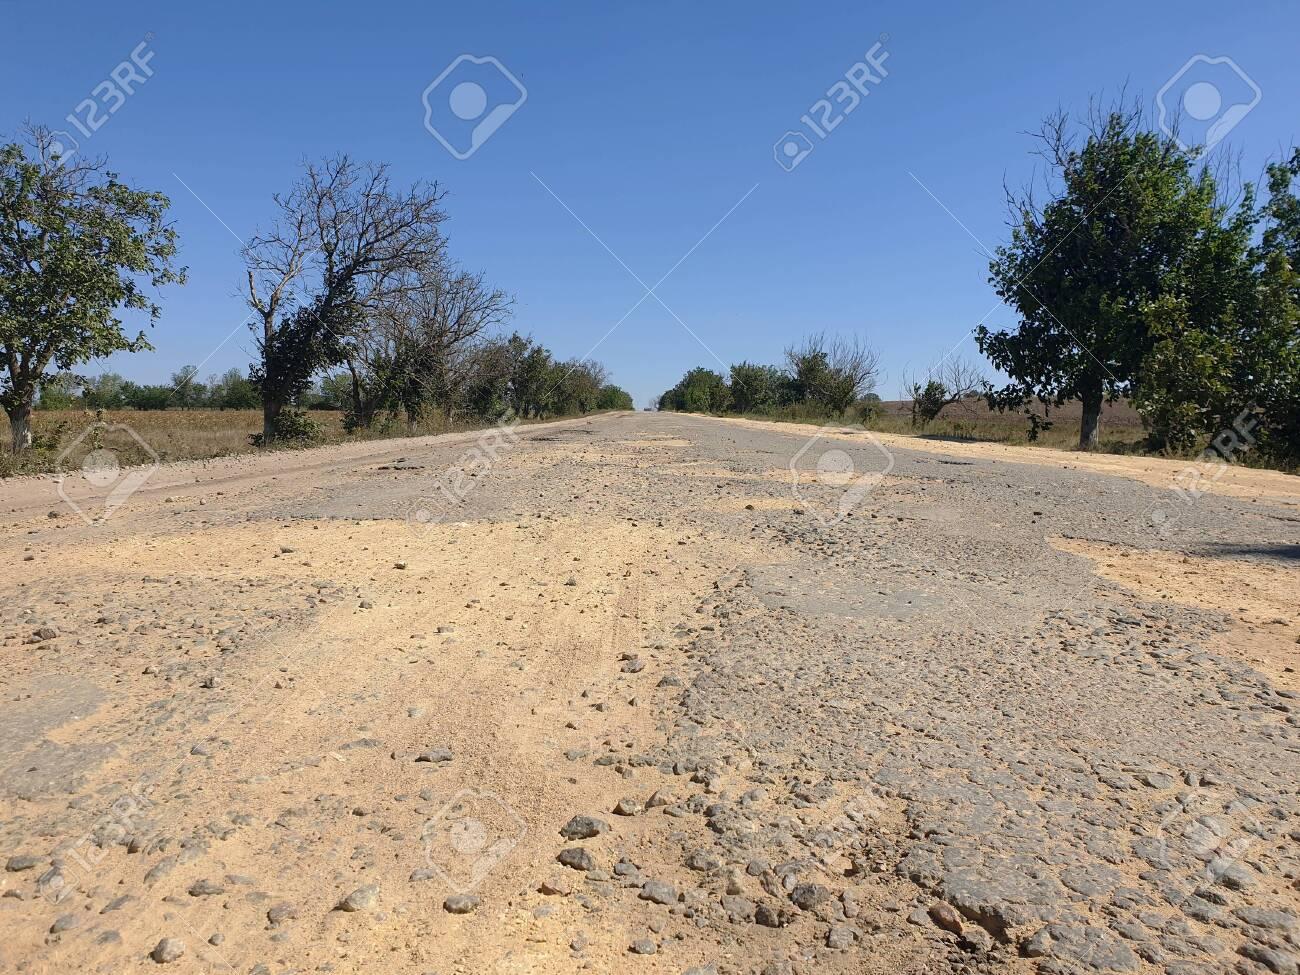 Dangerous road, potholes in the asphalt on the road - 155225398